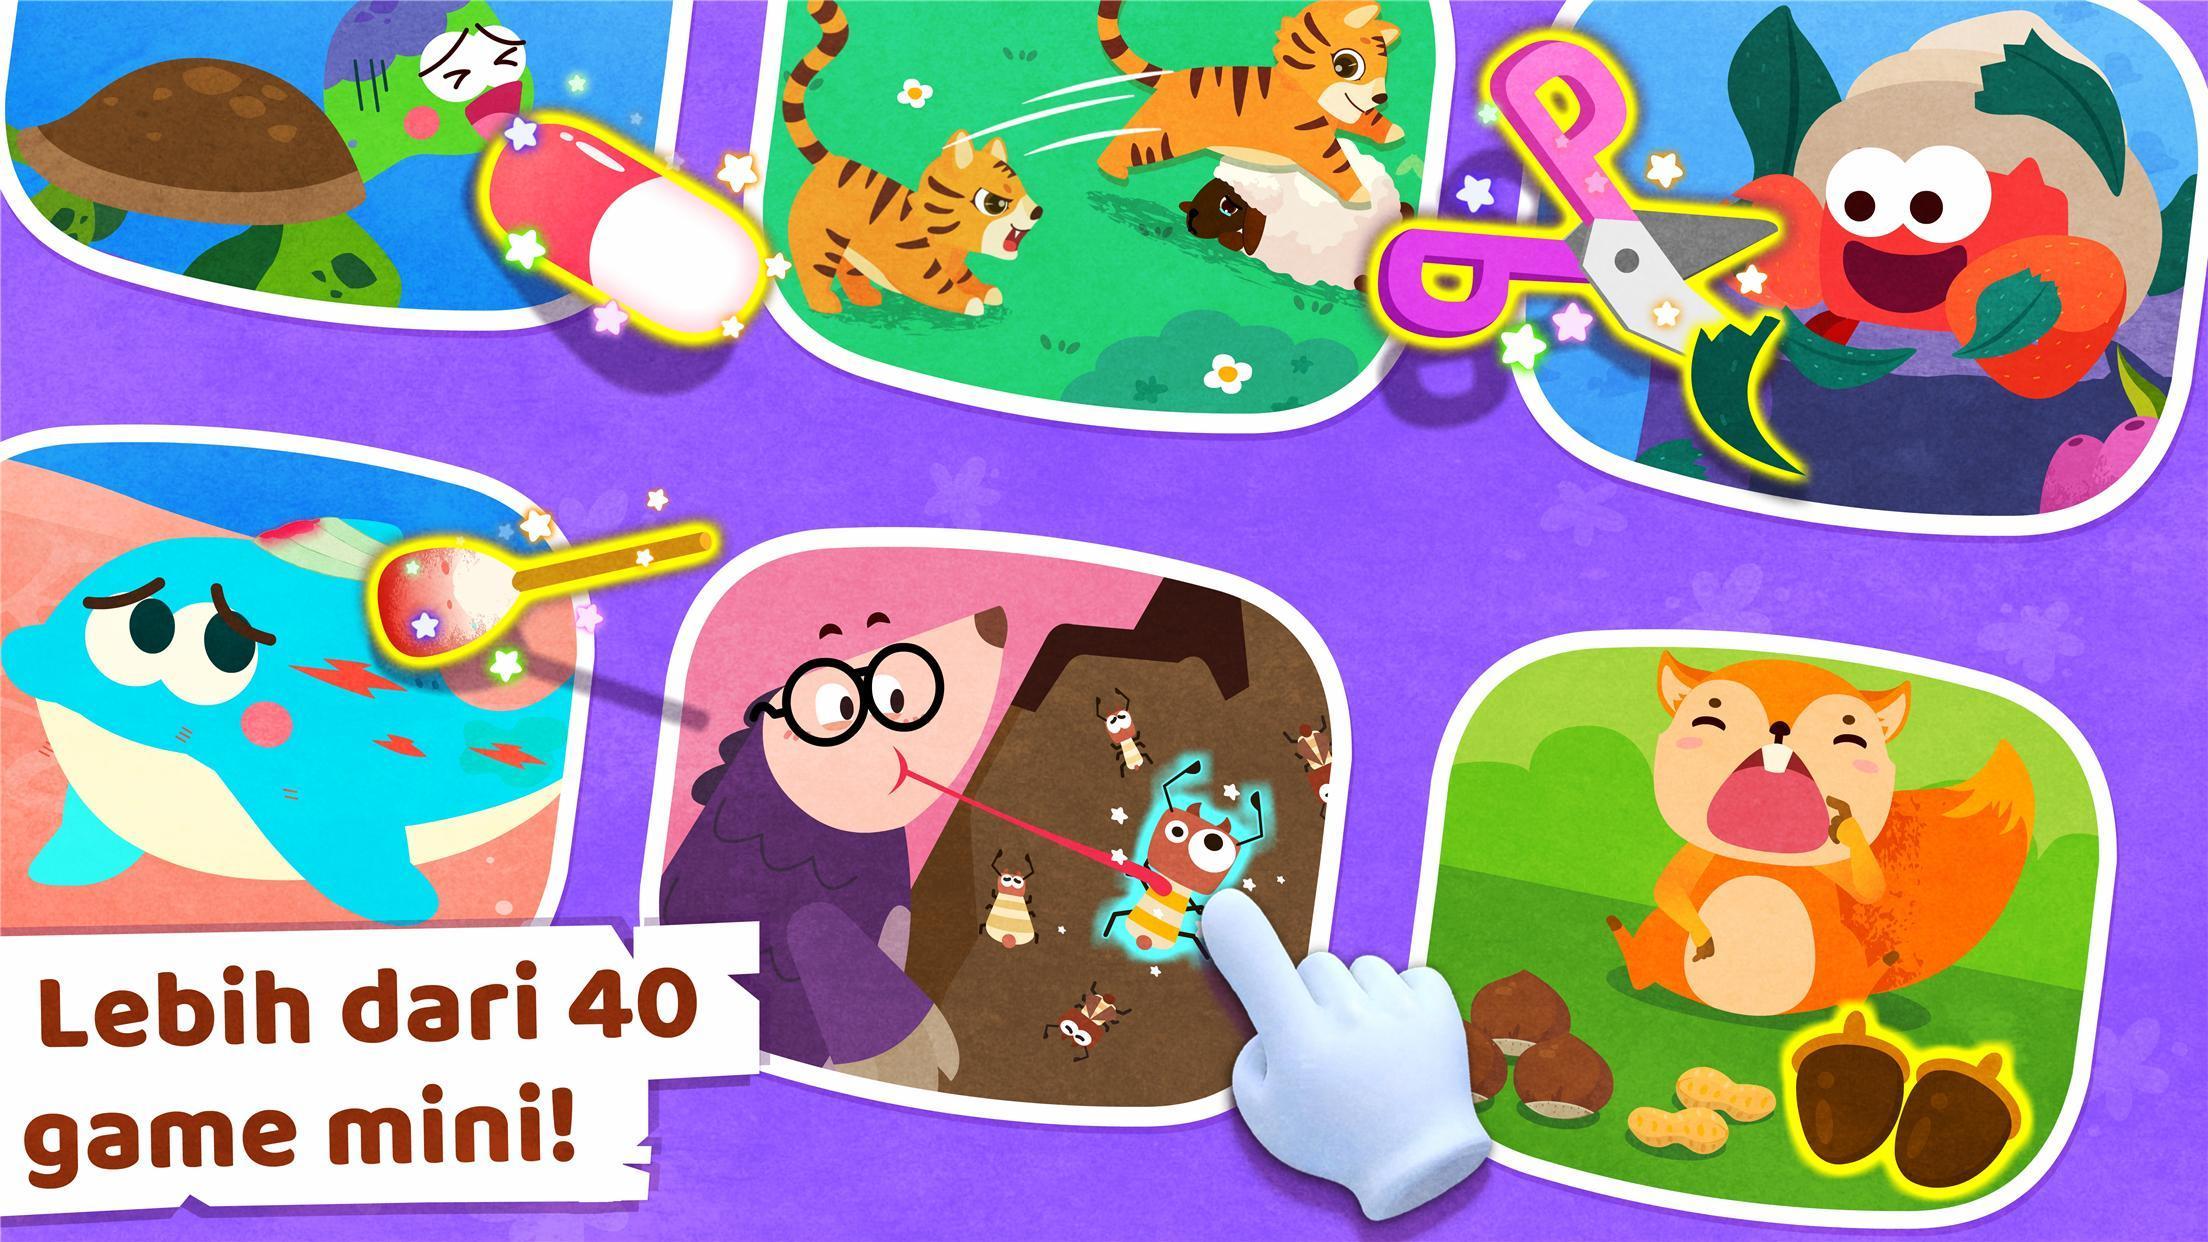 Download 46 Gambar Animasi Dunia Binatang Paling Keren